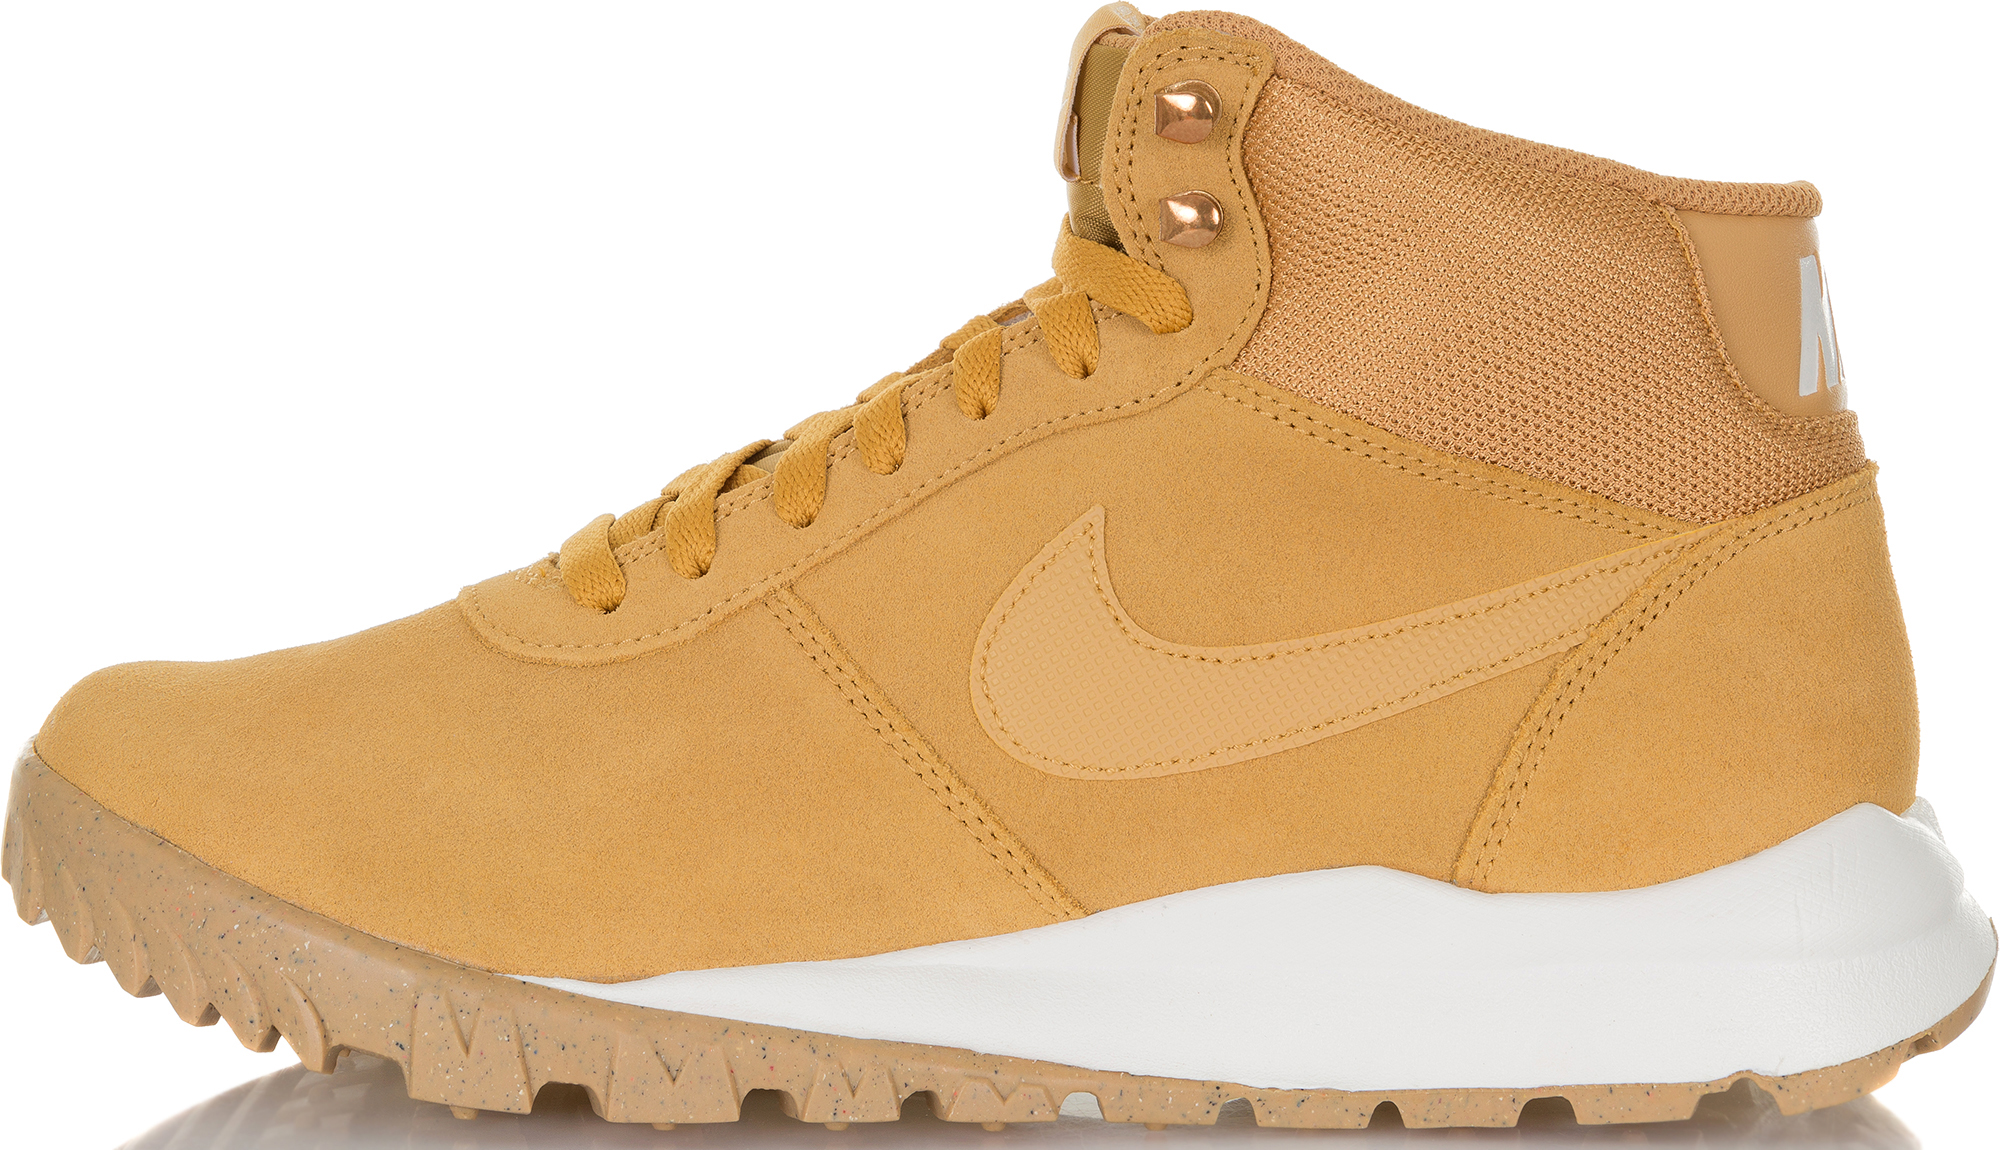 Nike Кроссовки утепленные мужские Nike Hoodland Suede, размер 45 кроссовки для тенниса мужские nike court lite цвет белый 845021 100 размер 10 5 43 5